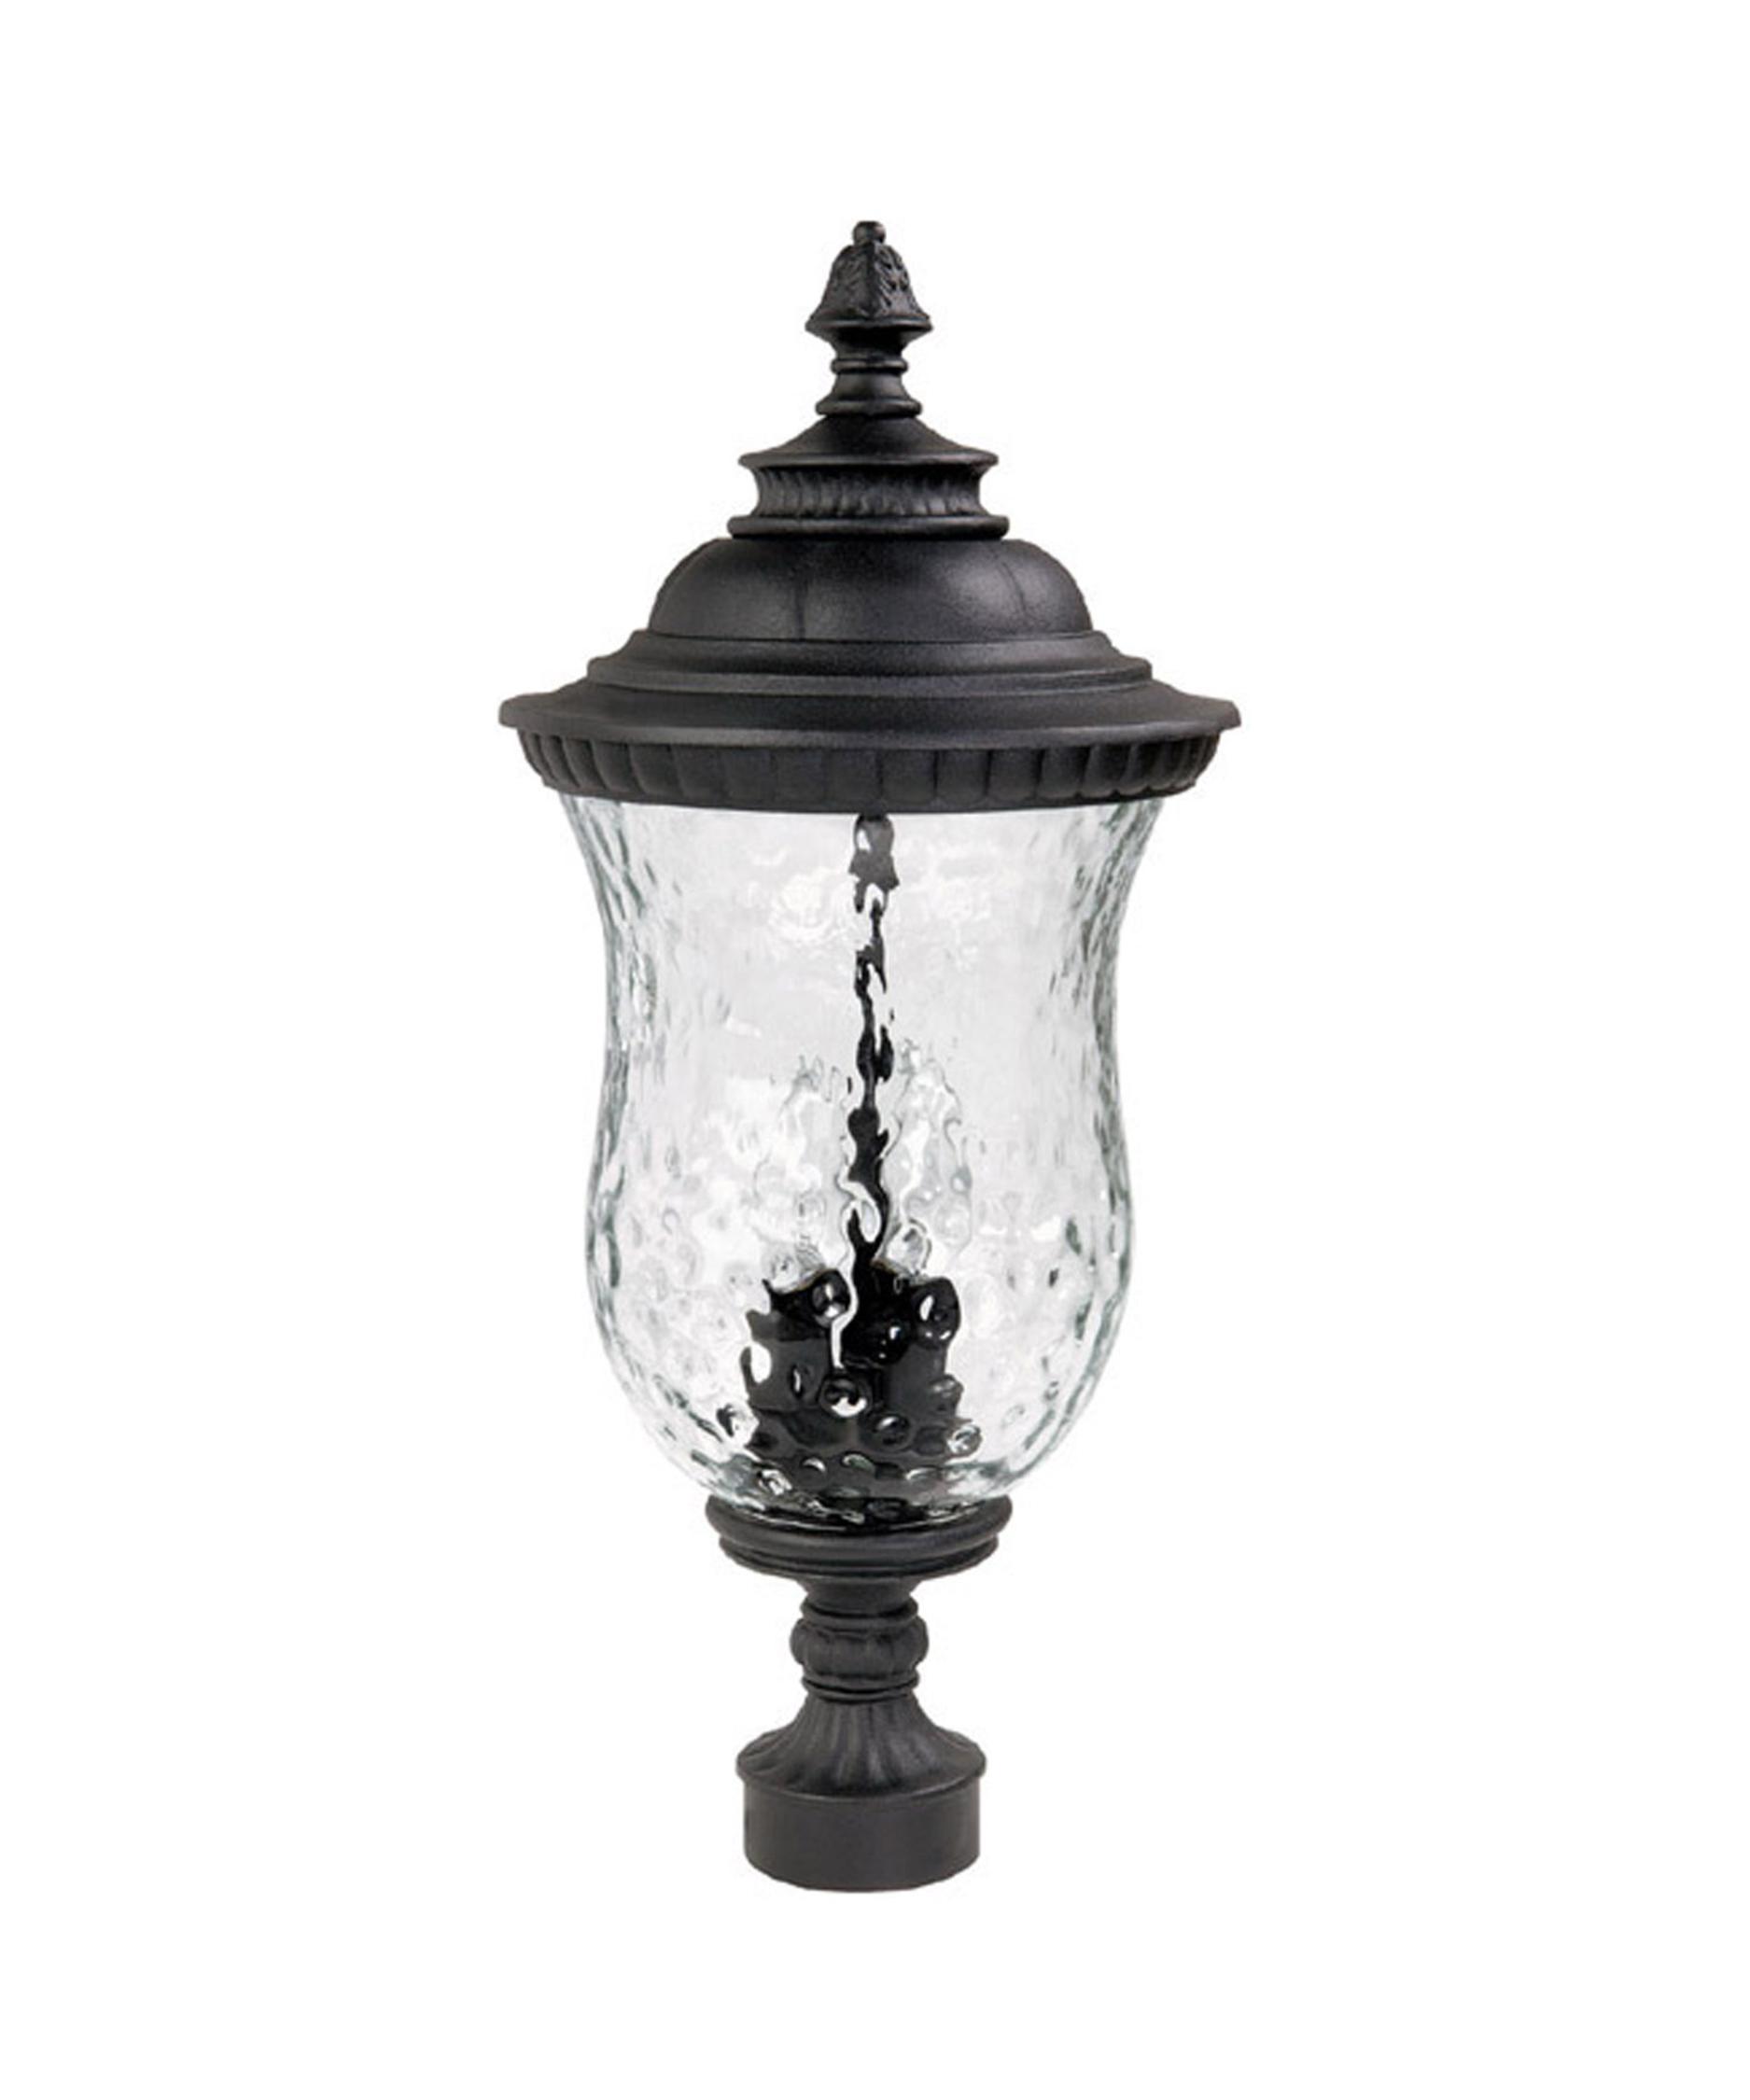 lighting 9785 ashford 3 light outdoor post lamp capitol lighting. Black Bedroom Furniture Sets. Home Design Ideas